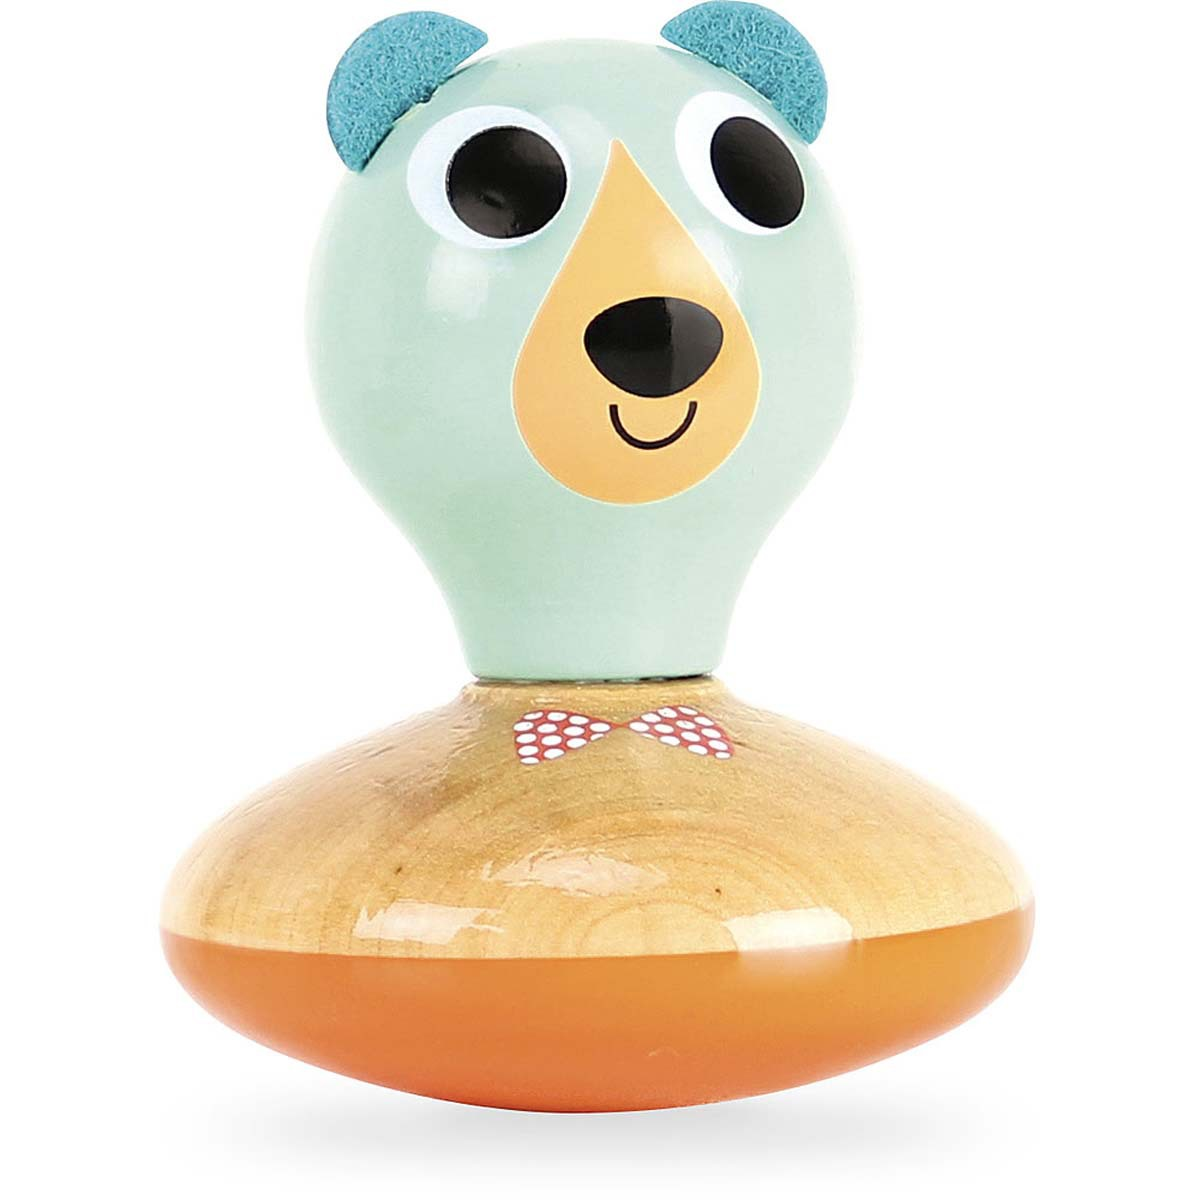 Mes premiers jouets Hochet-Culbuto-Maracas Ours par Ingela P. Arrhenius Hochet-Culbuto-Maracas Ours par Ingela P. Arrhenius